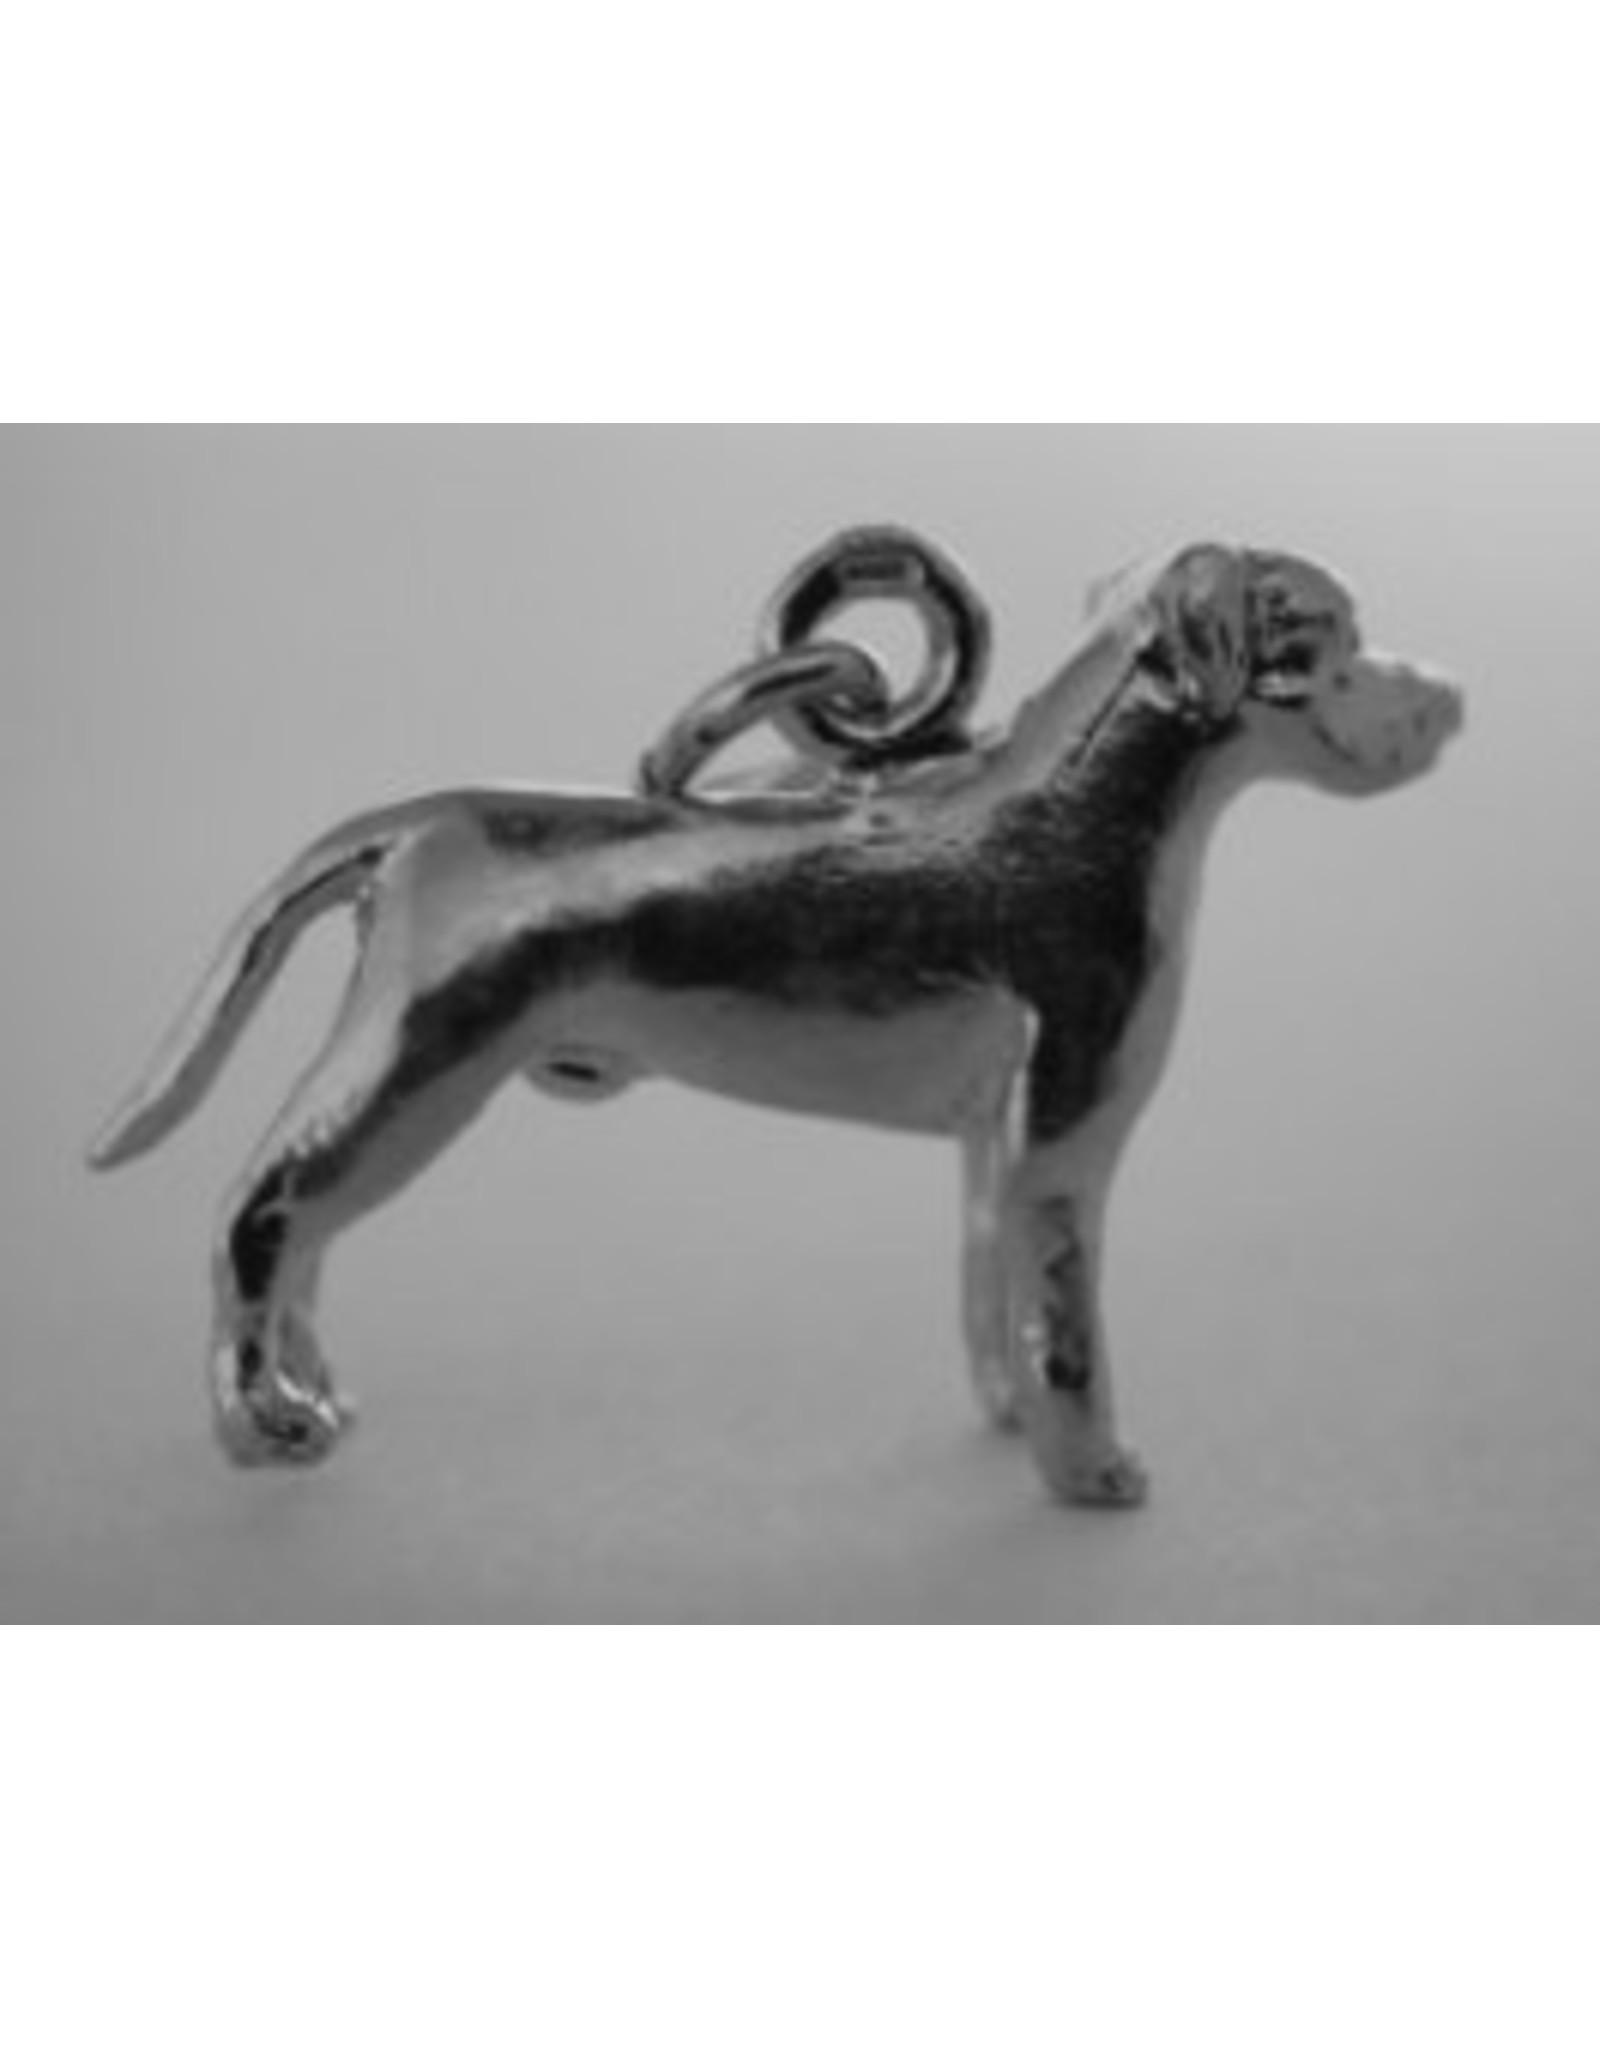 Handmade by Hanneke Weigel Sterling silver Cane corso